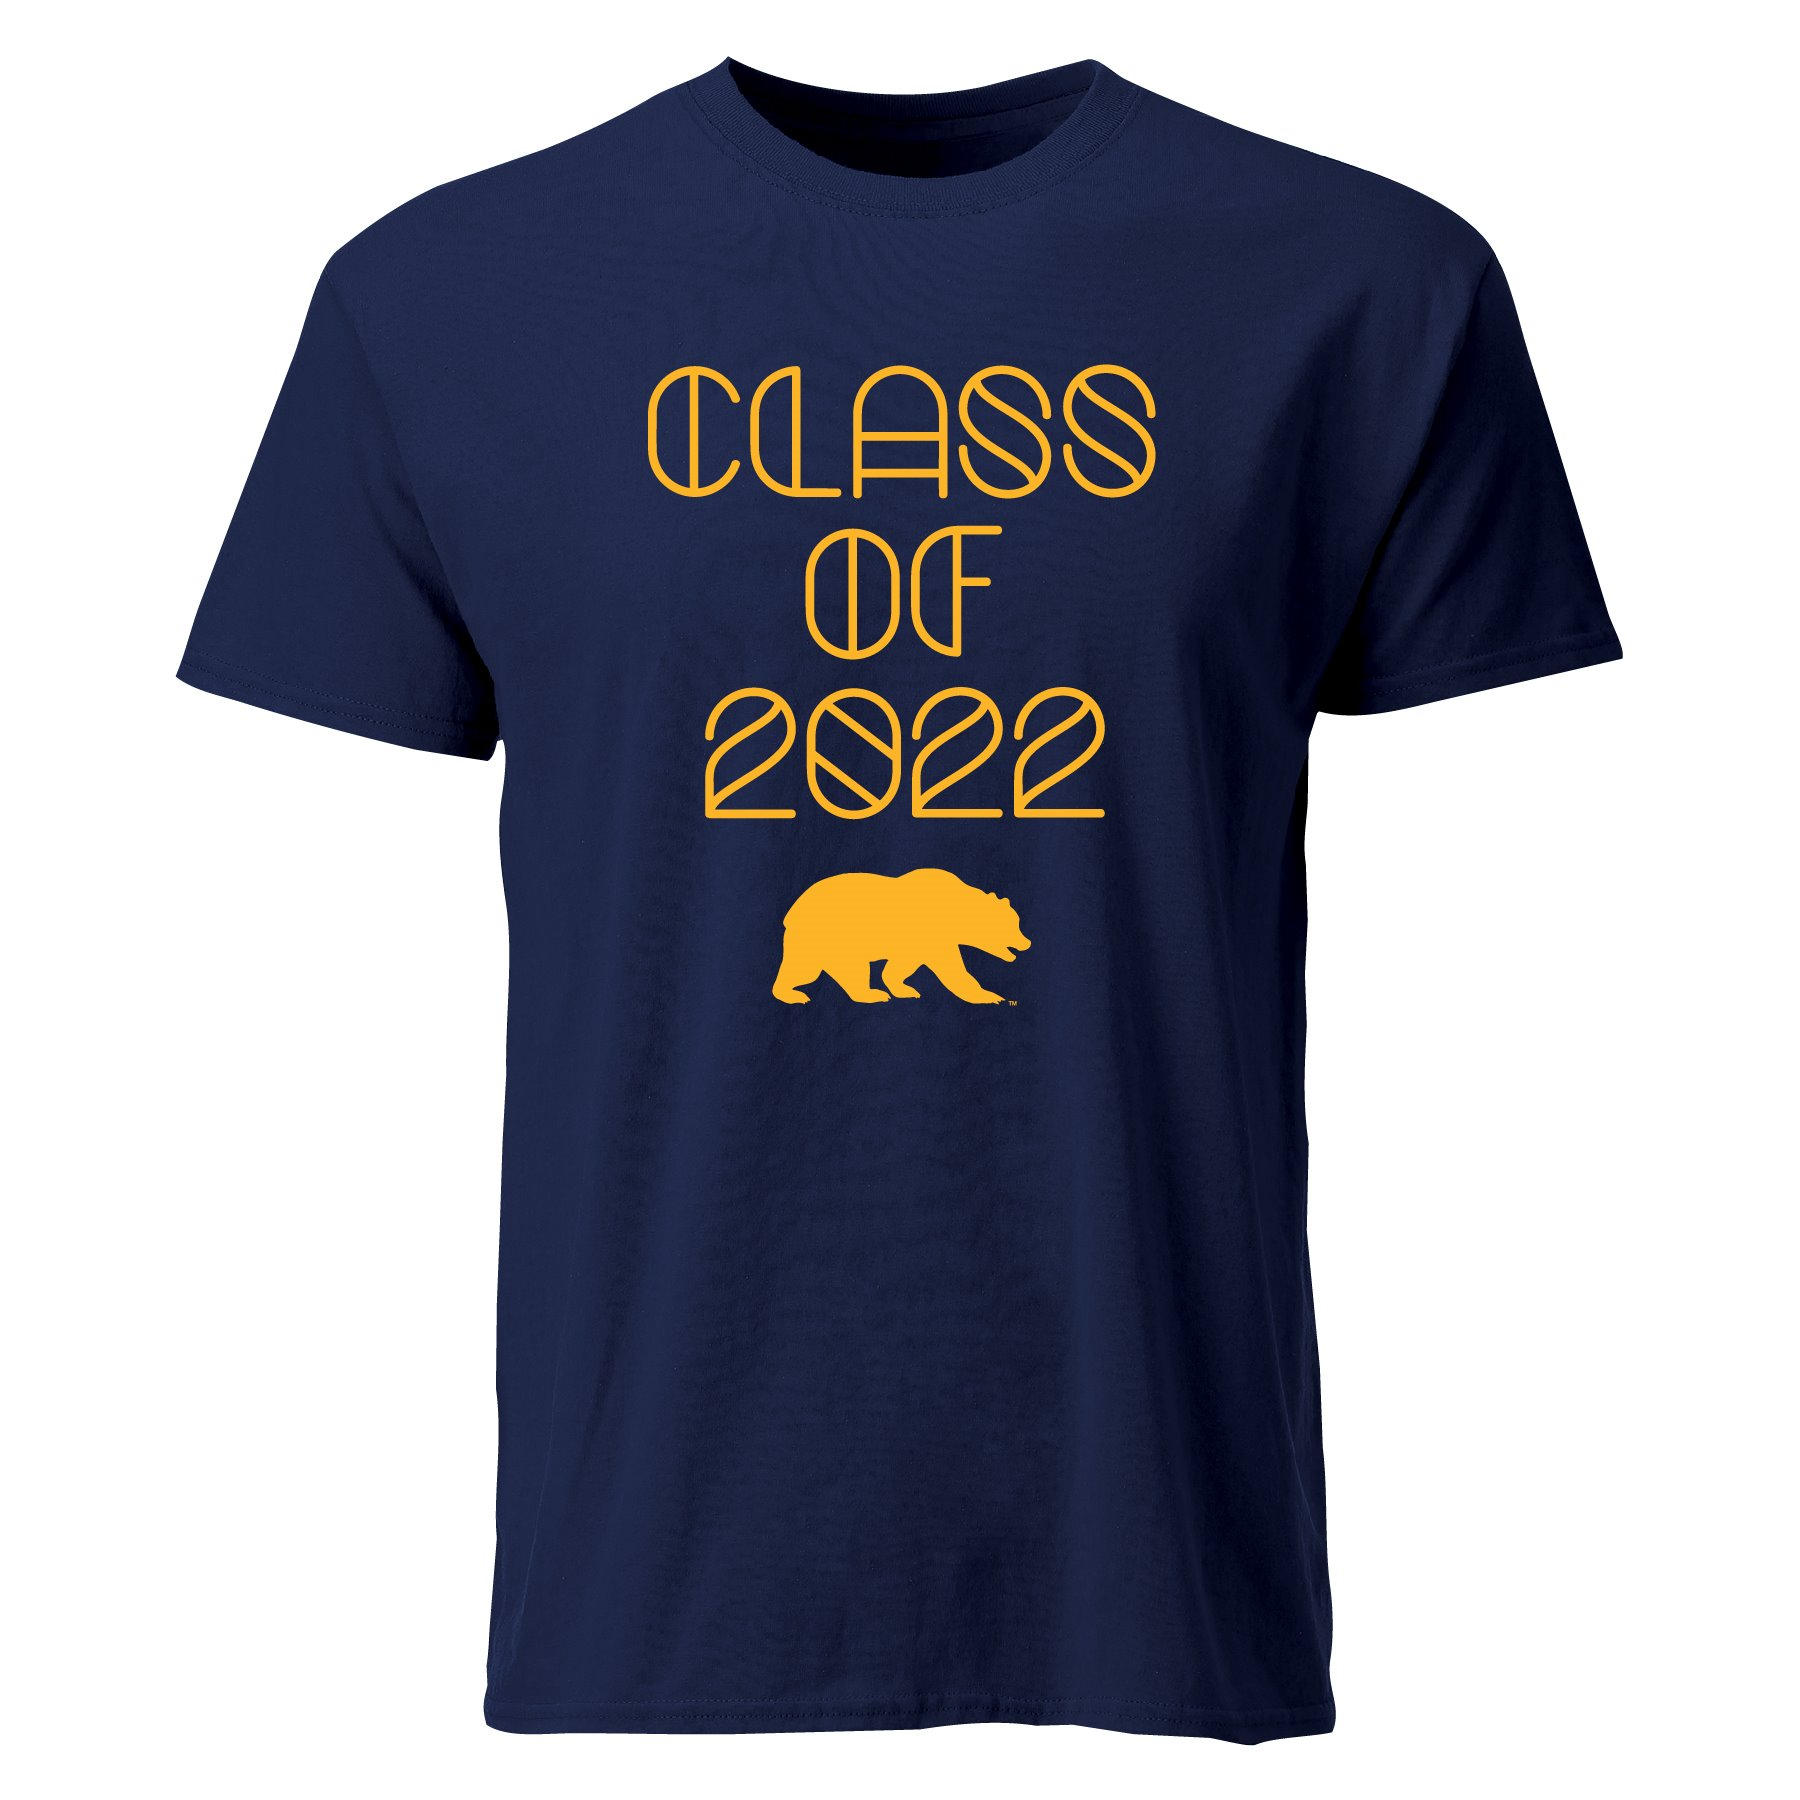 Cal Bears Class of 2022 Tee